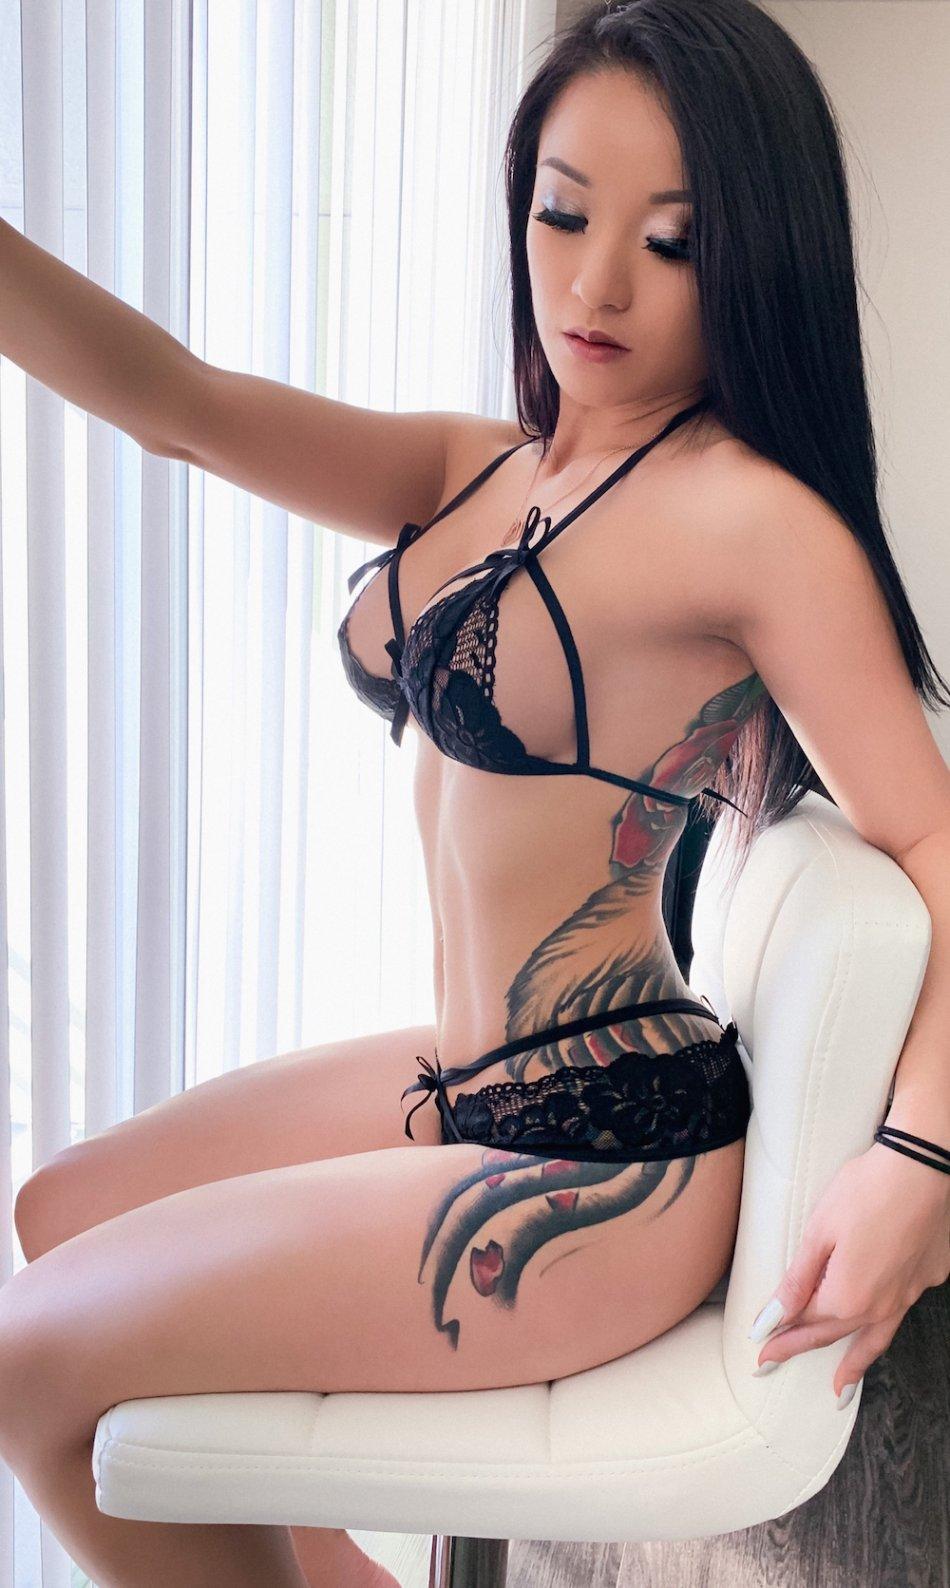 Asian 😝 women hot Naked Asian